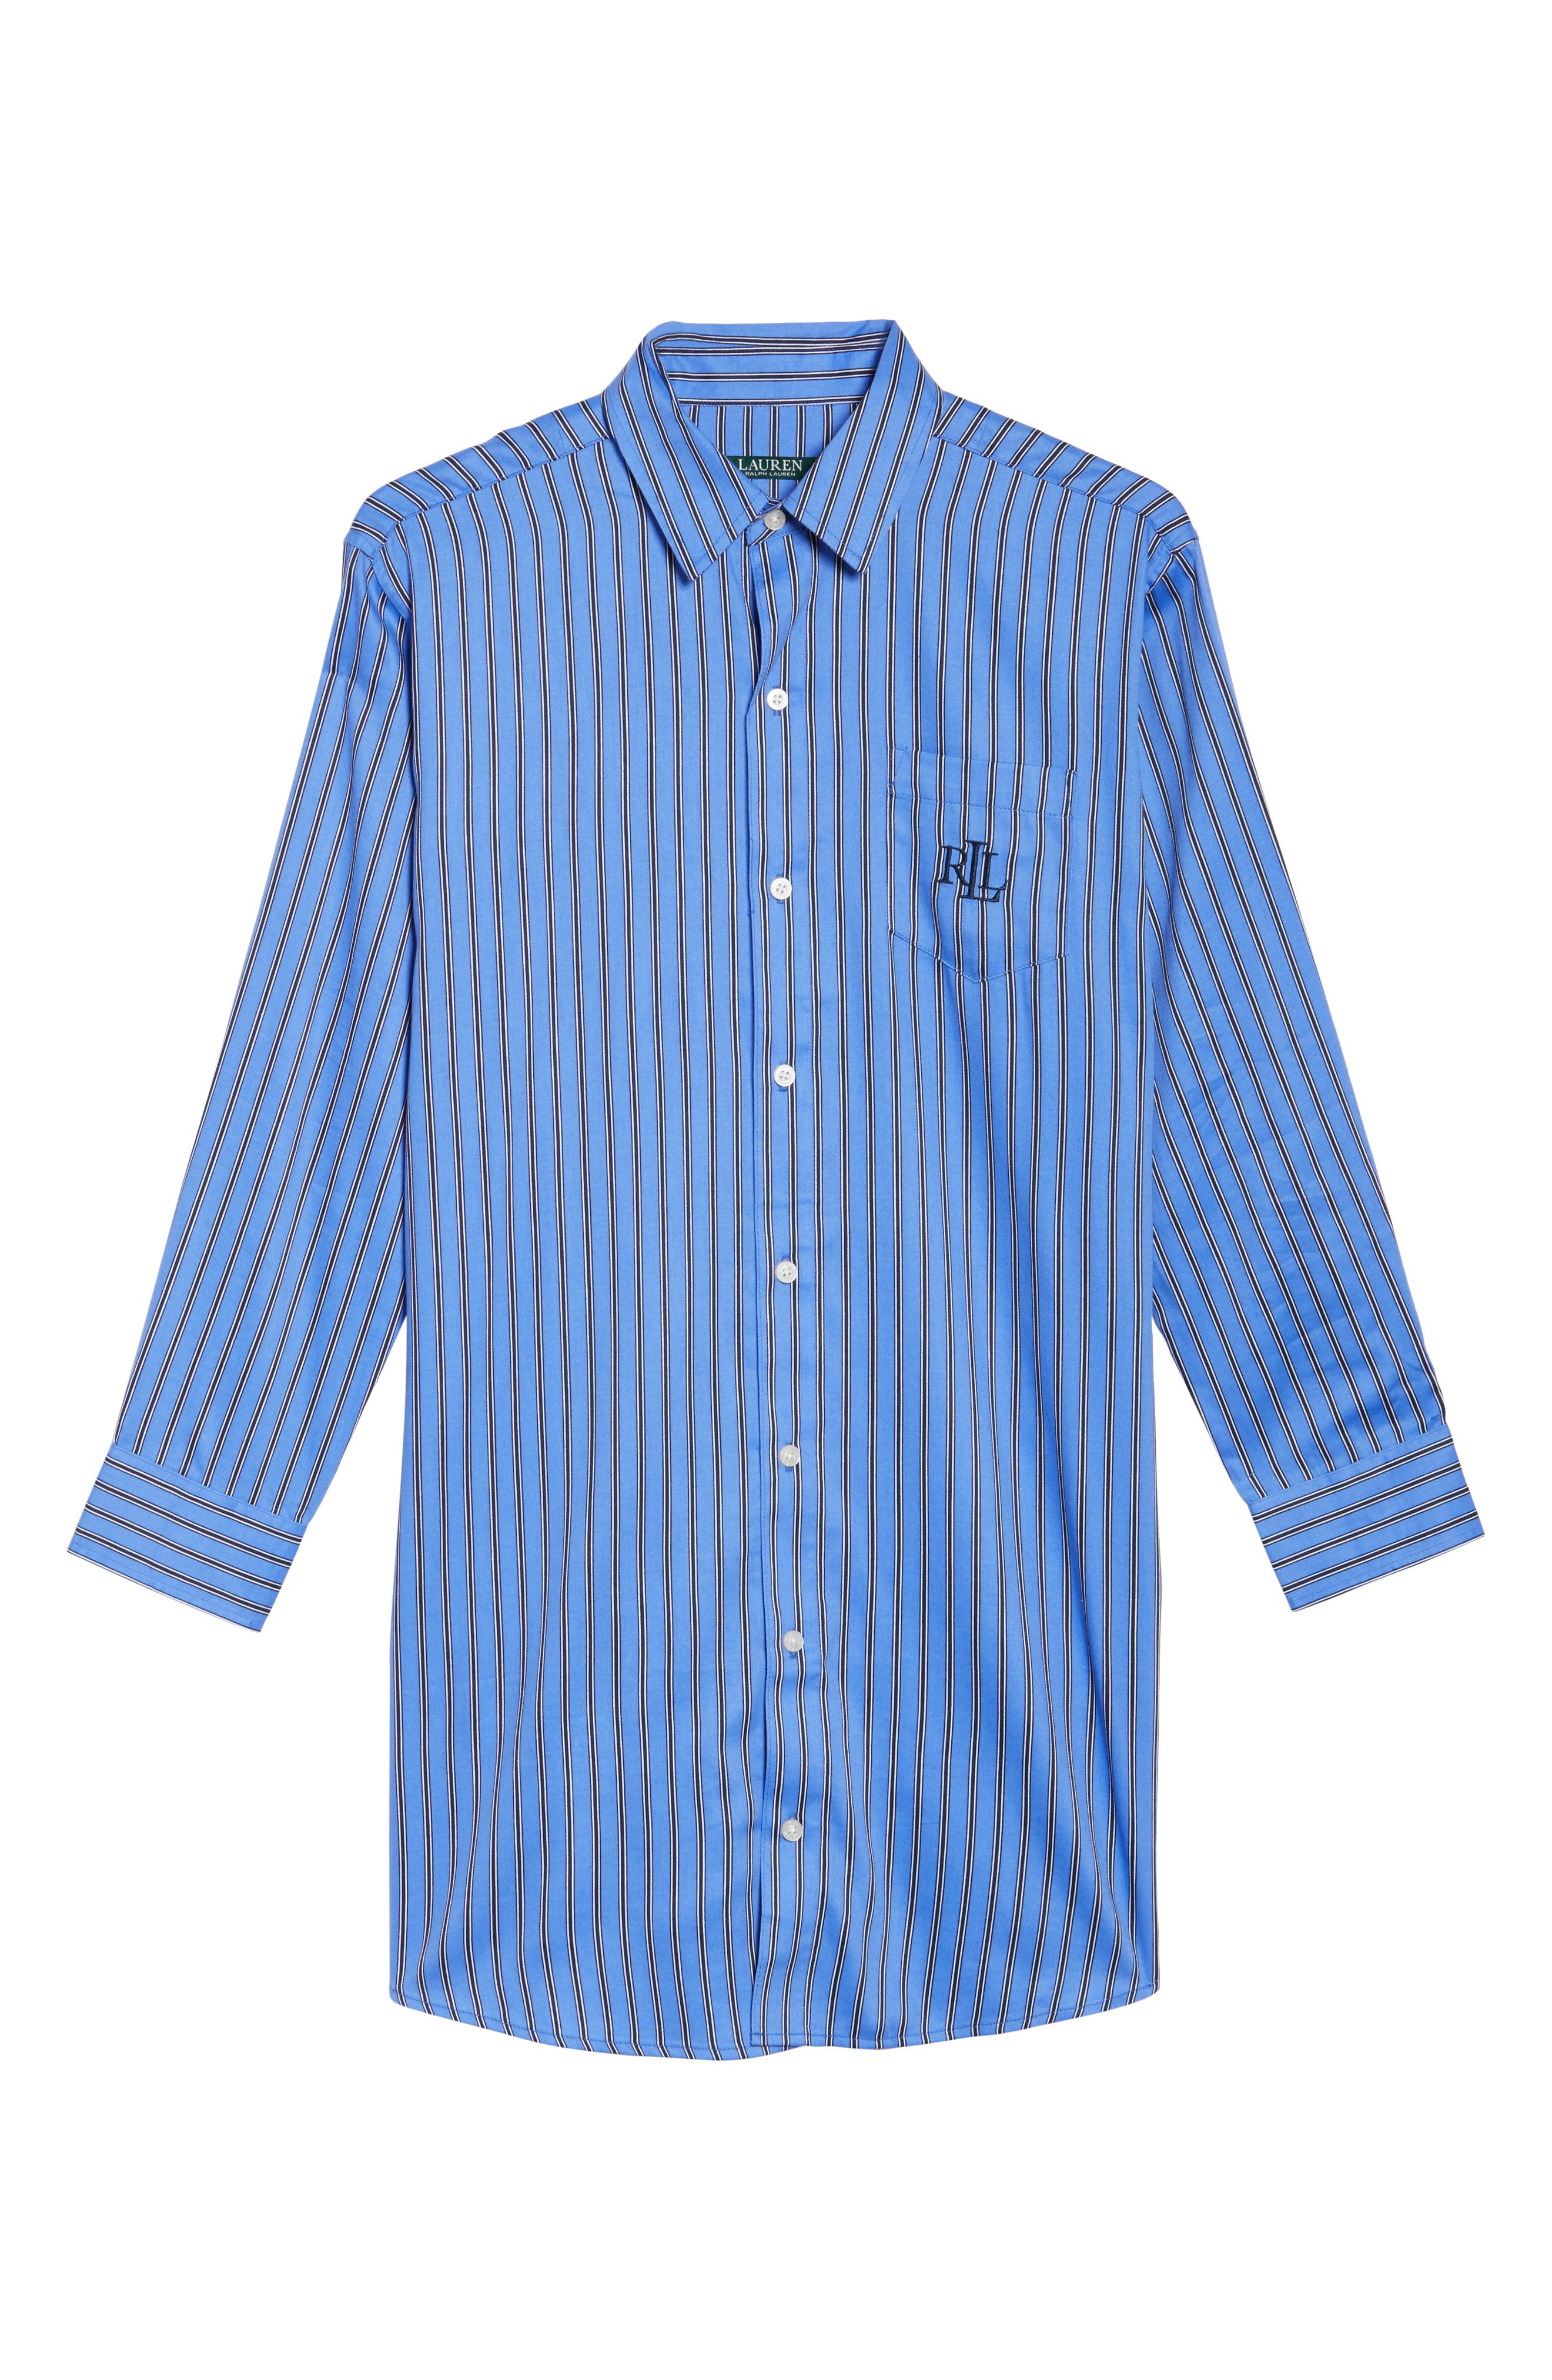 Alternate Image 4  - Lauren by Ralph Lauren Paisley Sleep Shirt